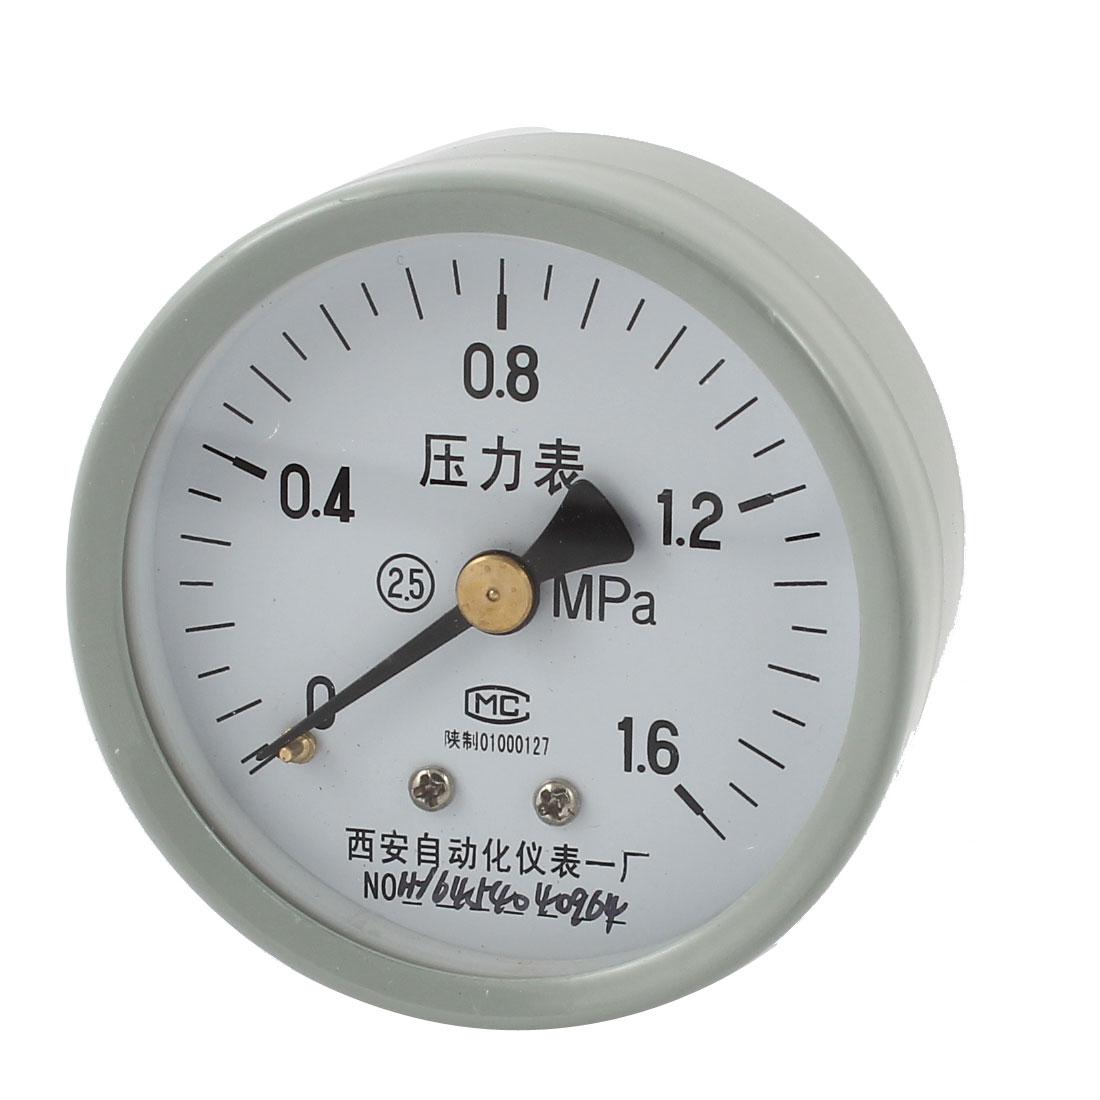 1/4PT Threaded 0-1.6Mpa Arabic Number Display Air Pressure Measuring Gauge